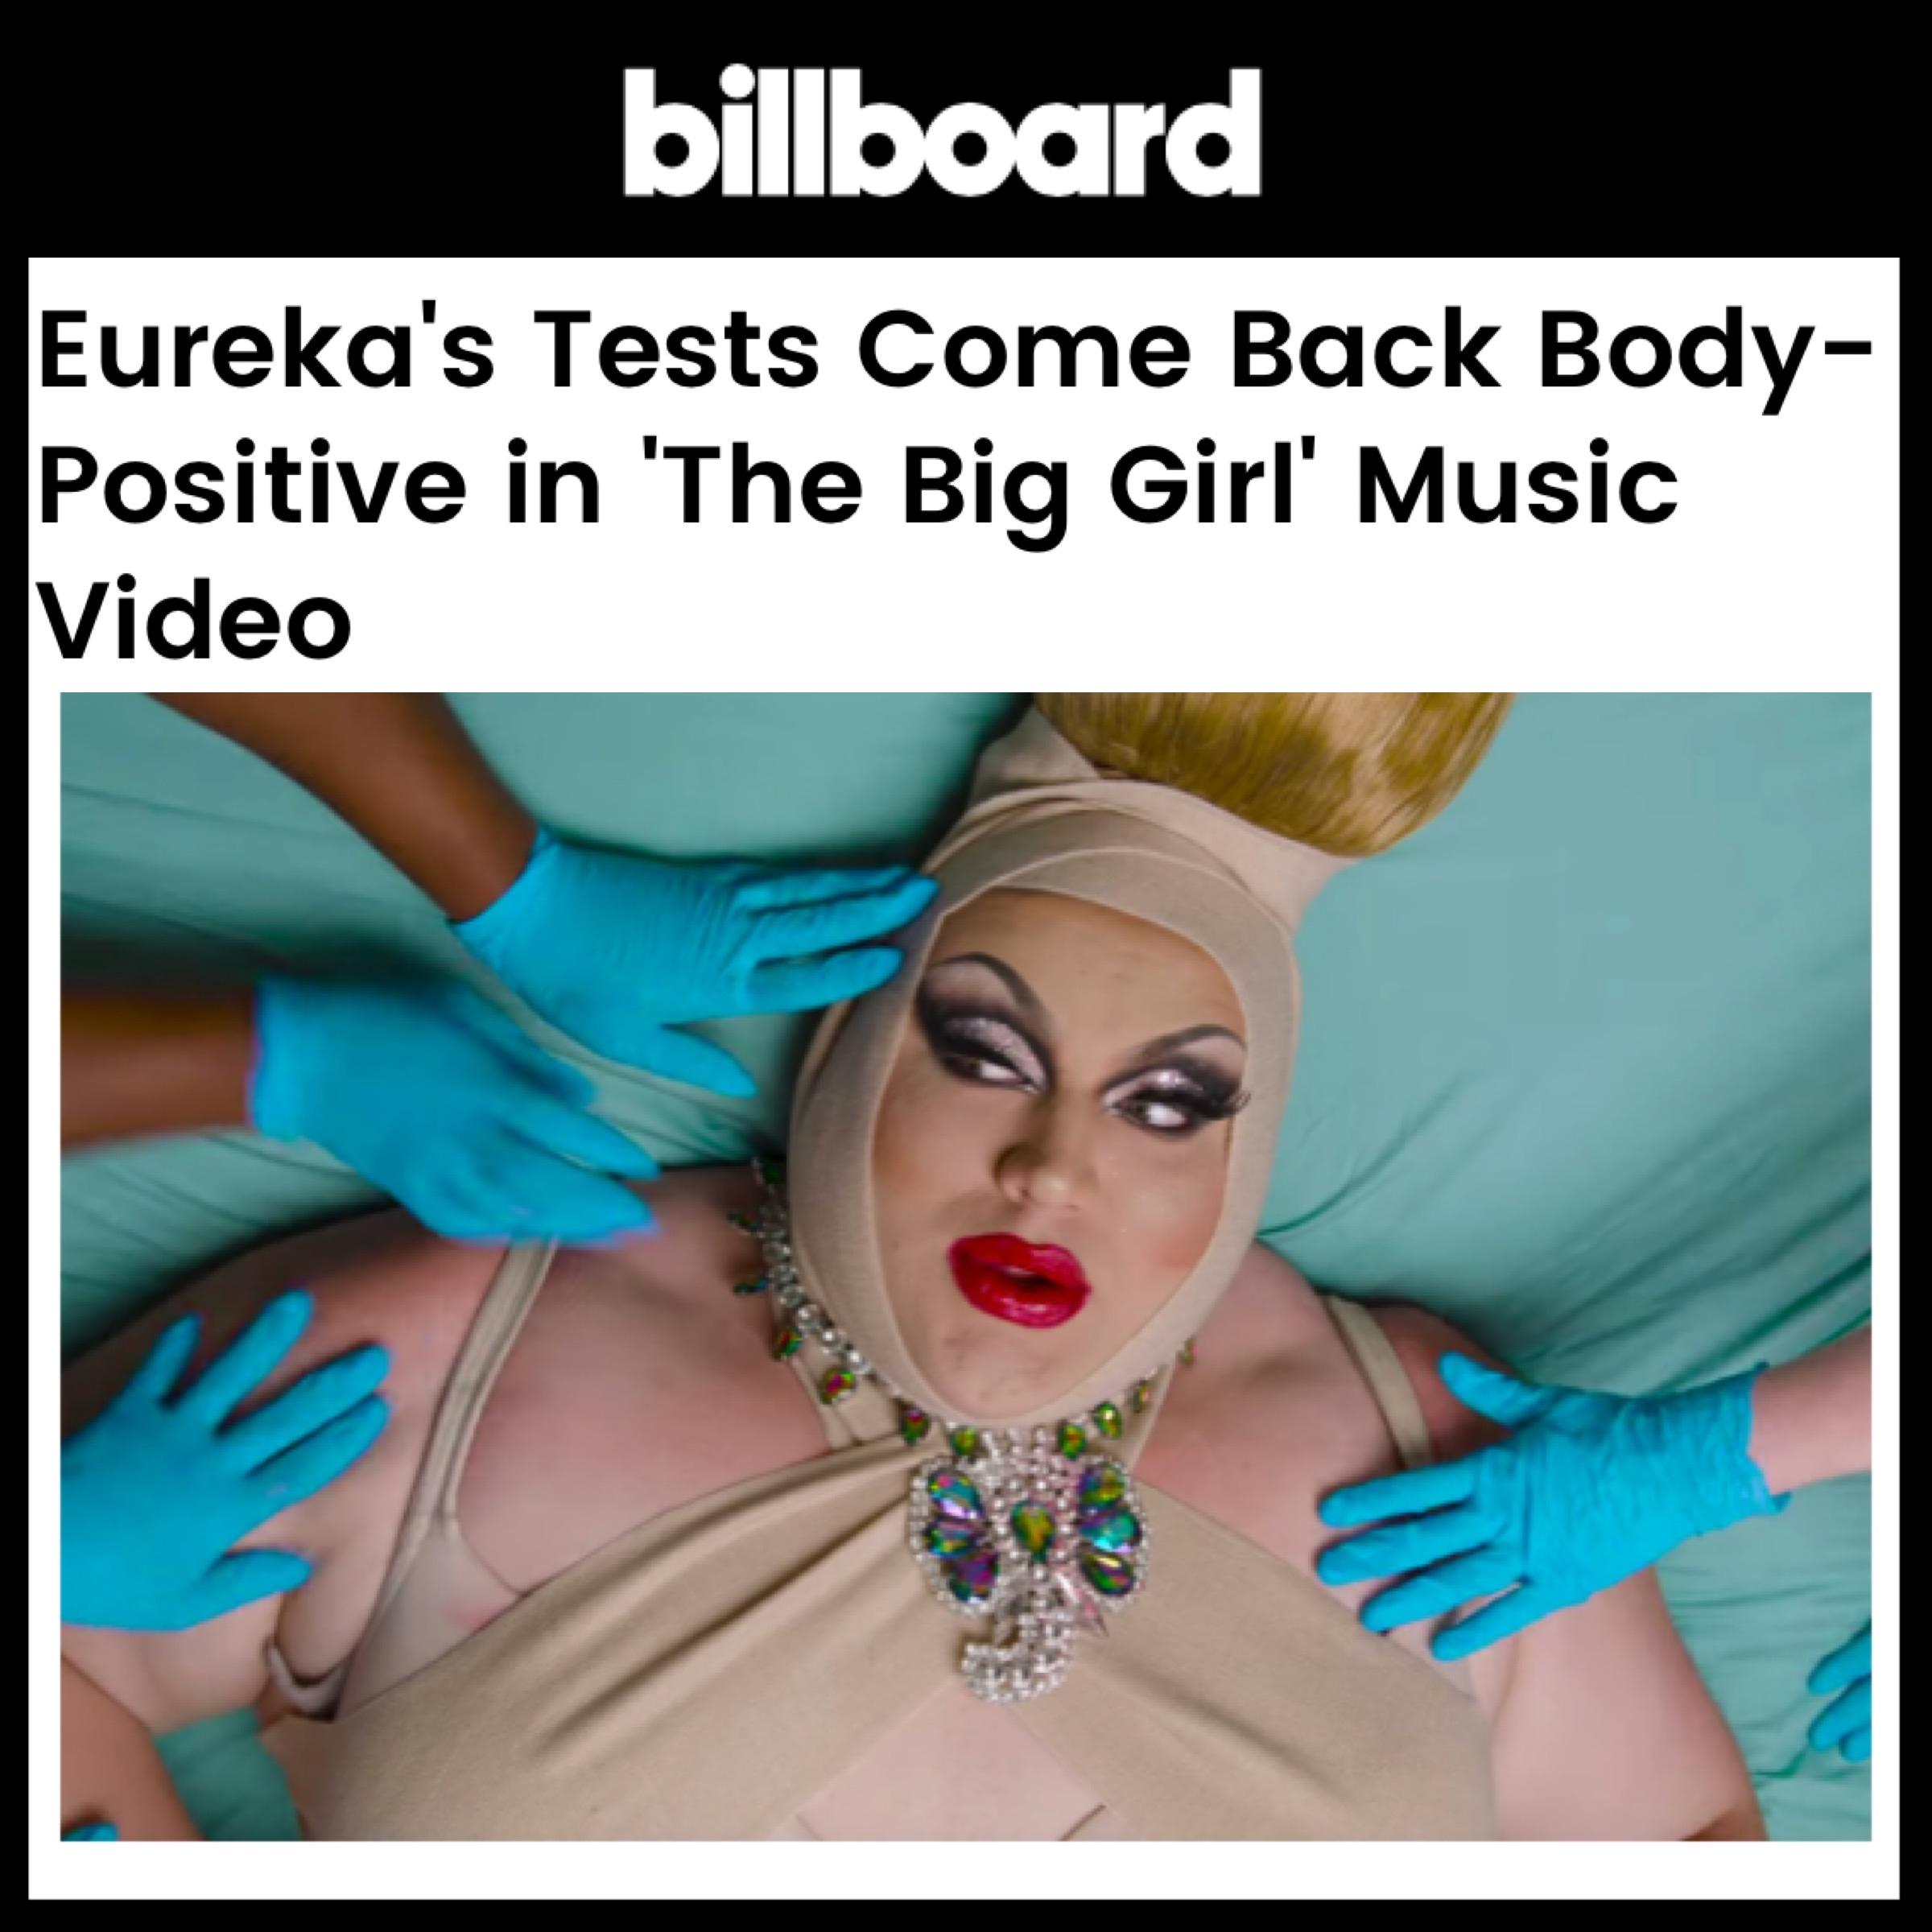 BILLBOARD - EUREKA (THE BIG GIRL)